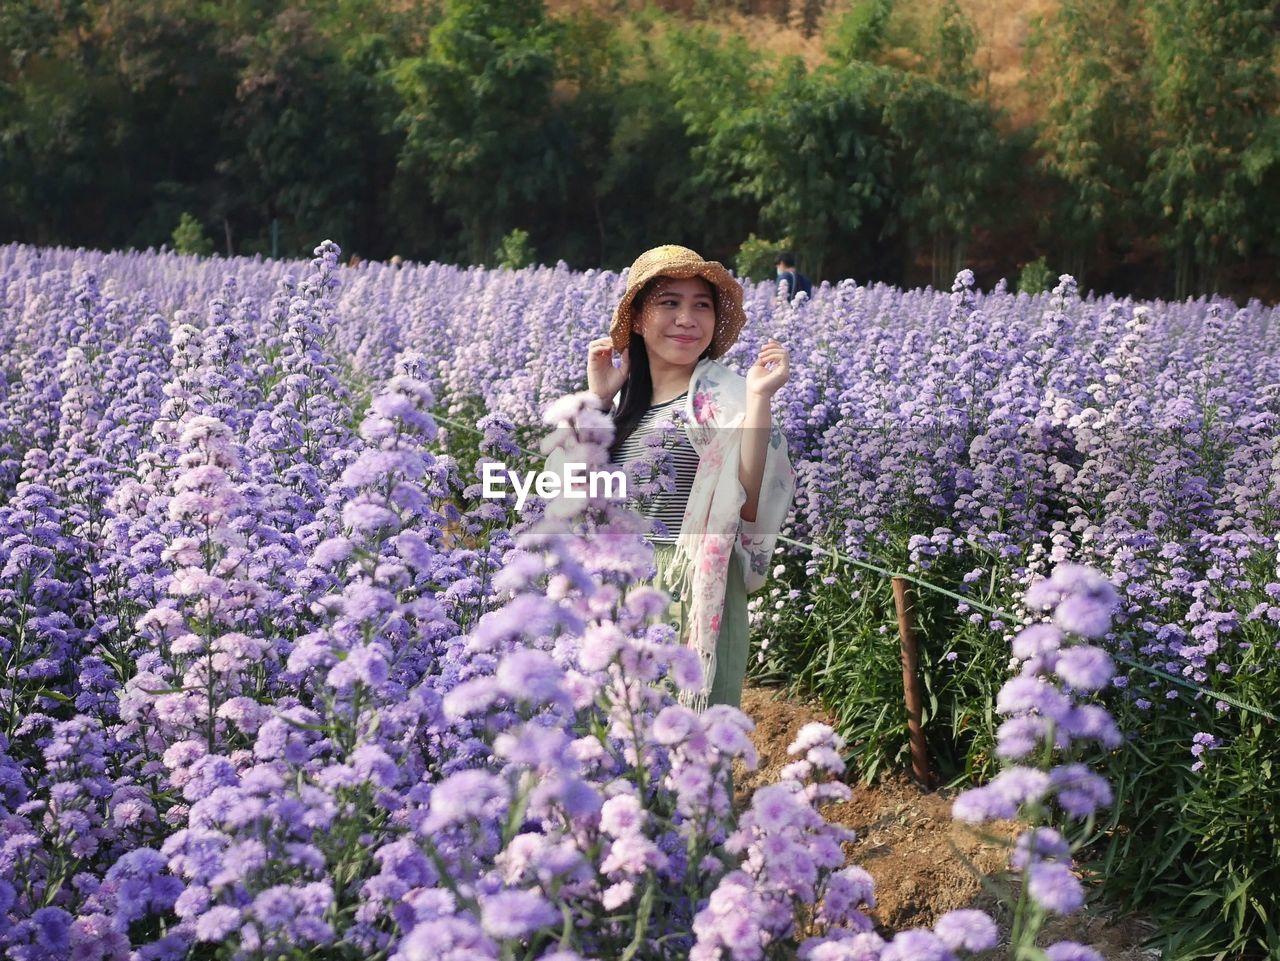 Portrait of woman with purple flowers on plants